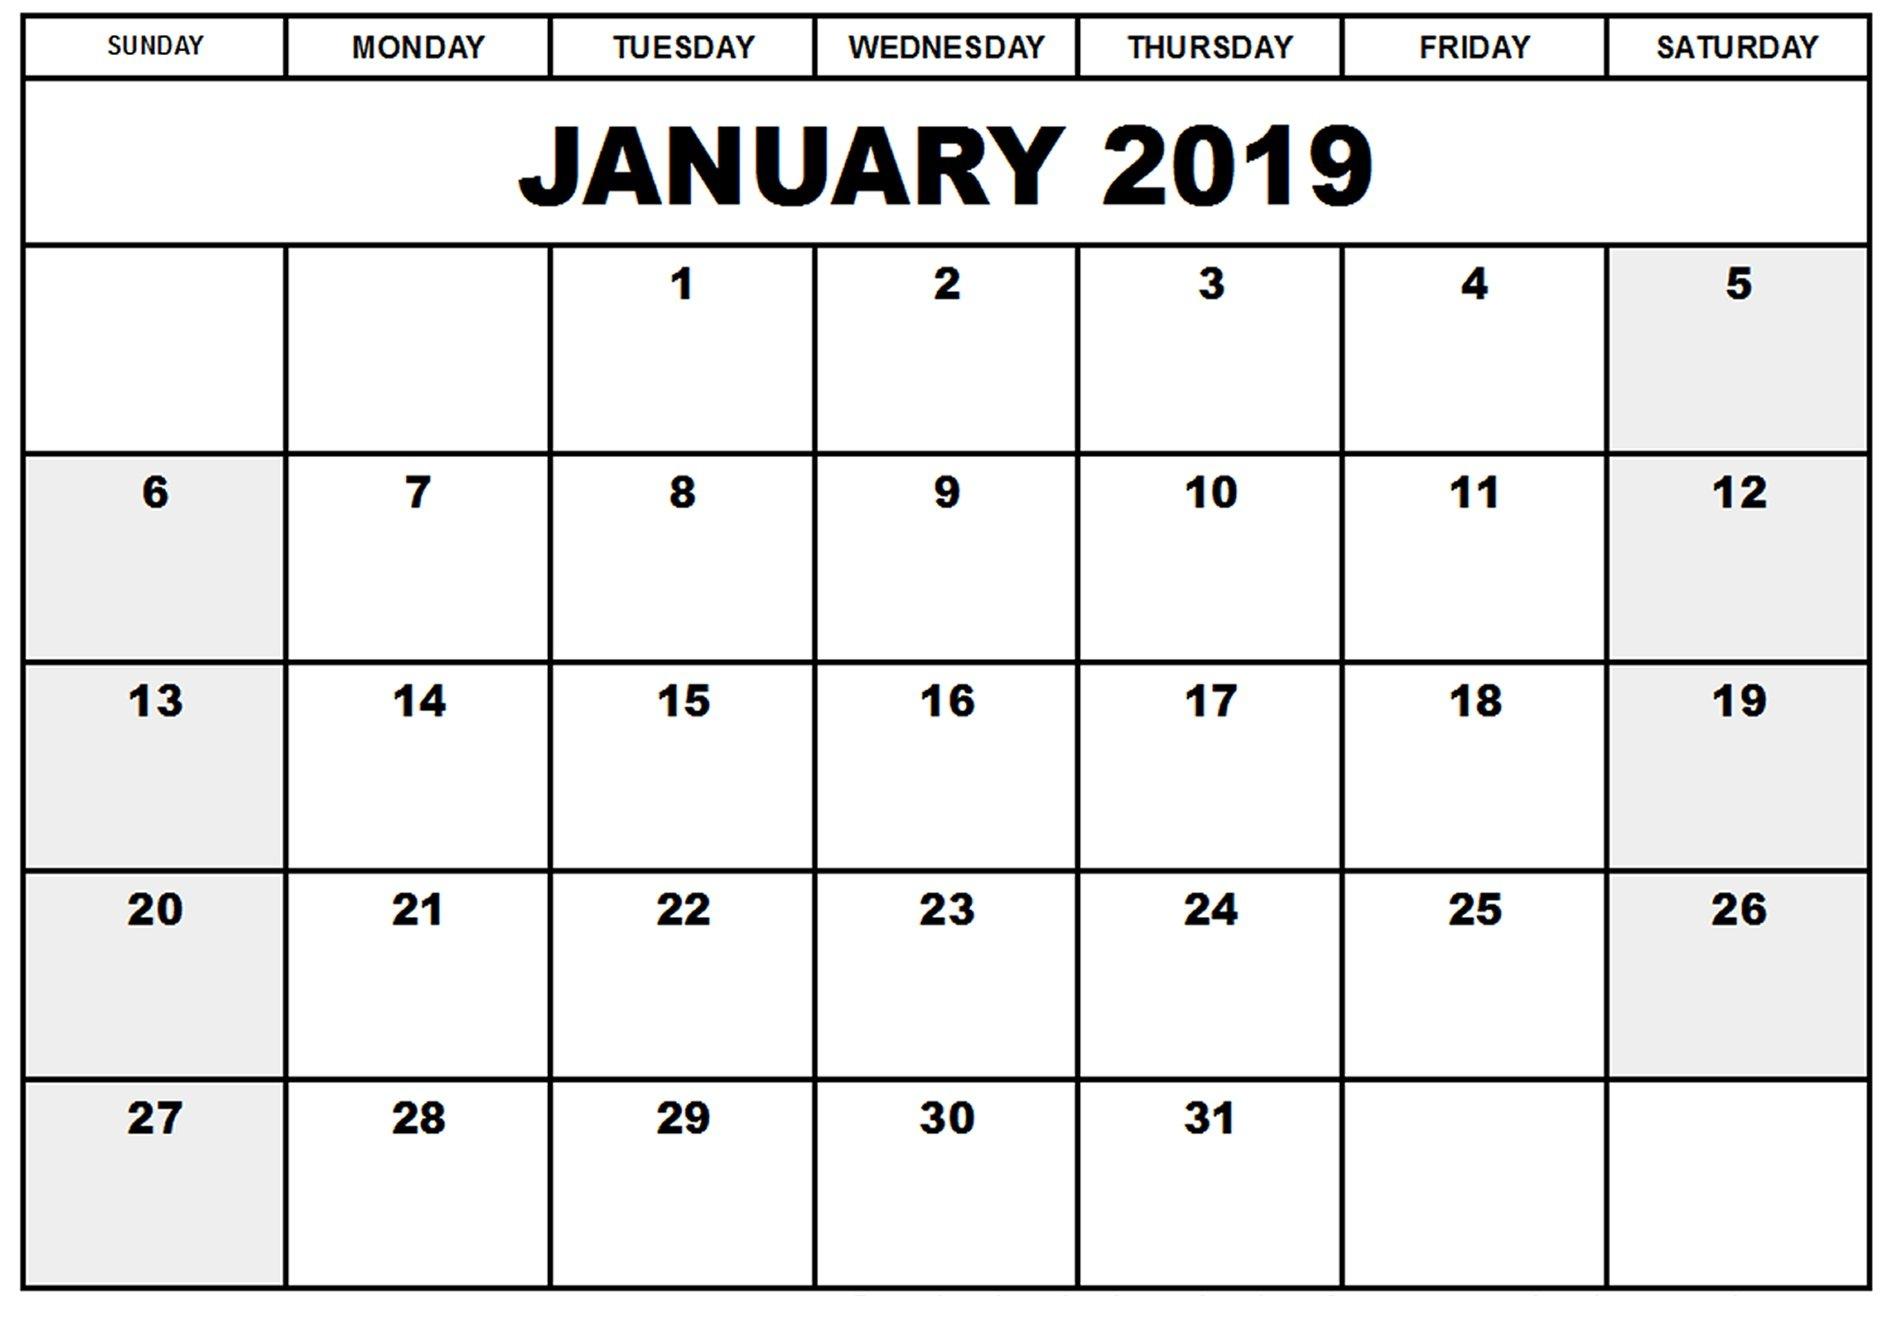 Free January 2019 Printable Calendar Templates – Calendar Printable Calendar I Can Edit